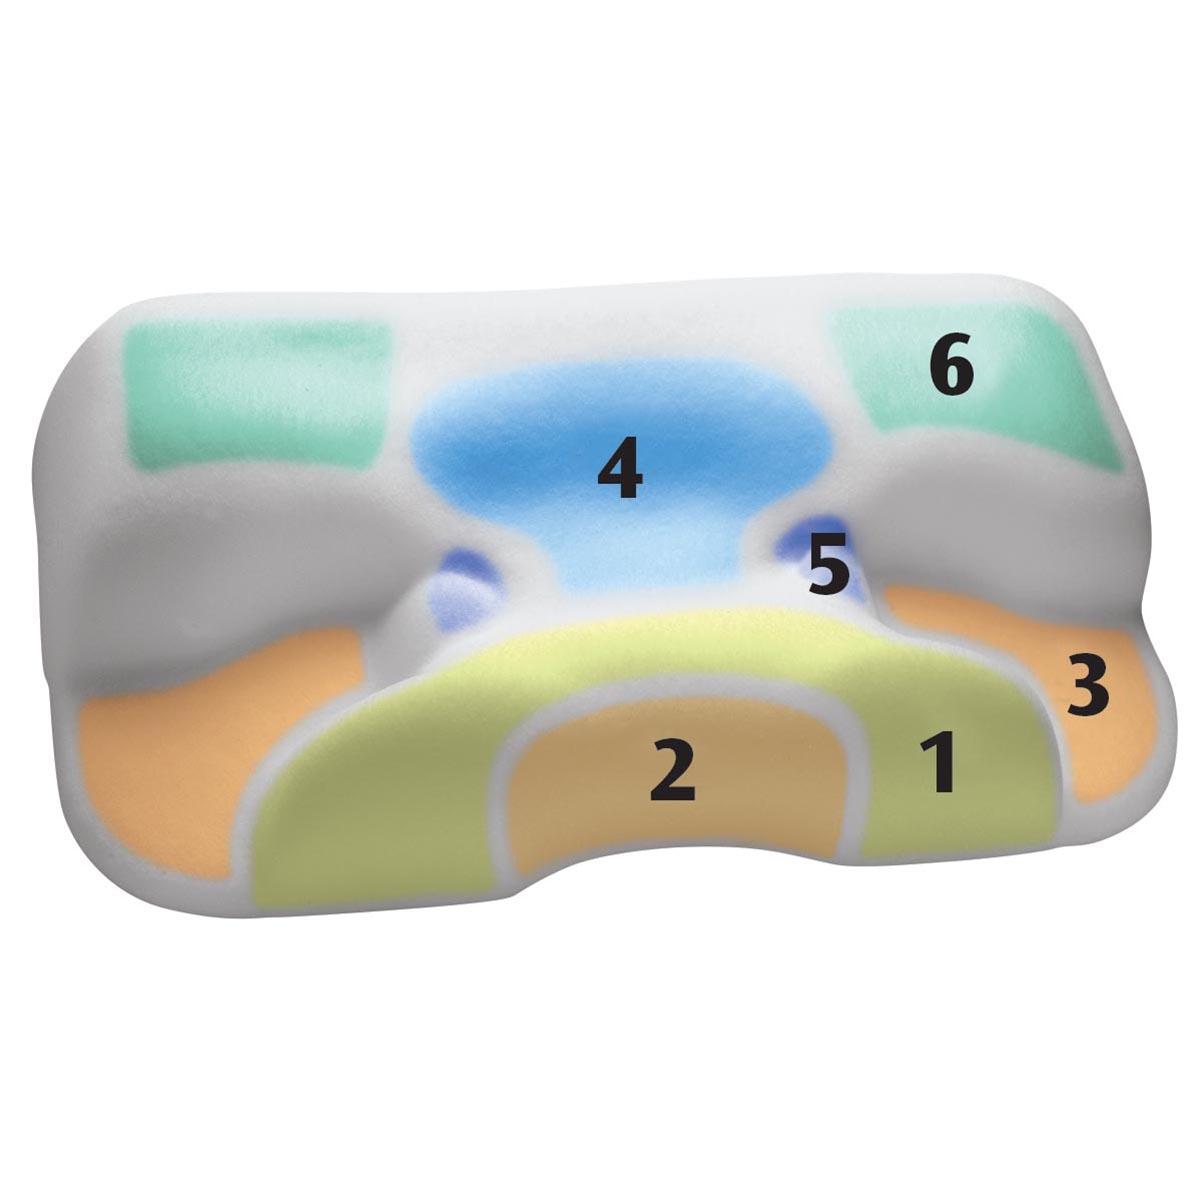 Cpap sleep apnea pillow, circadian clocks how rhythms